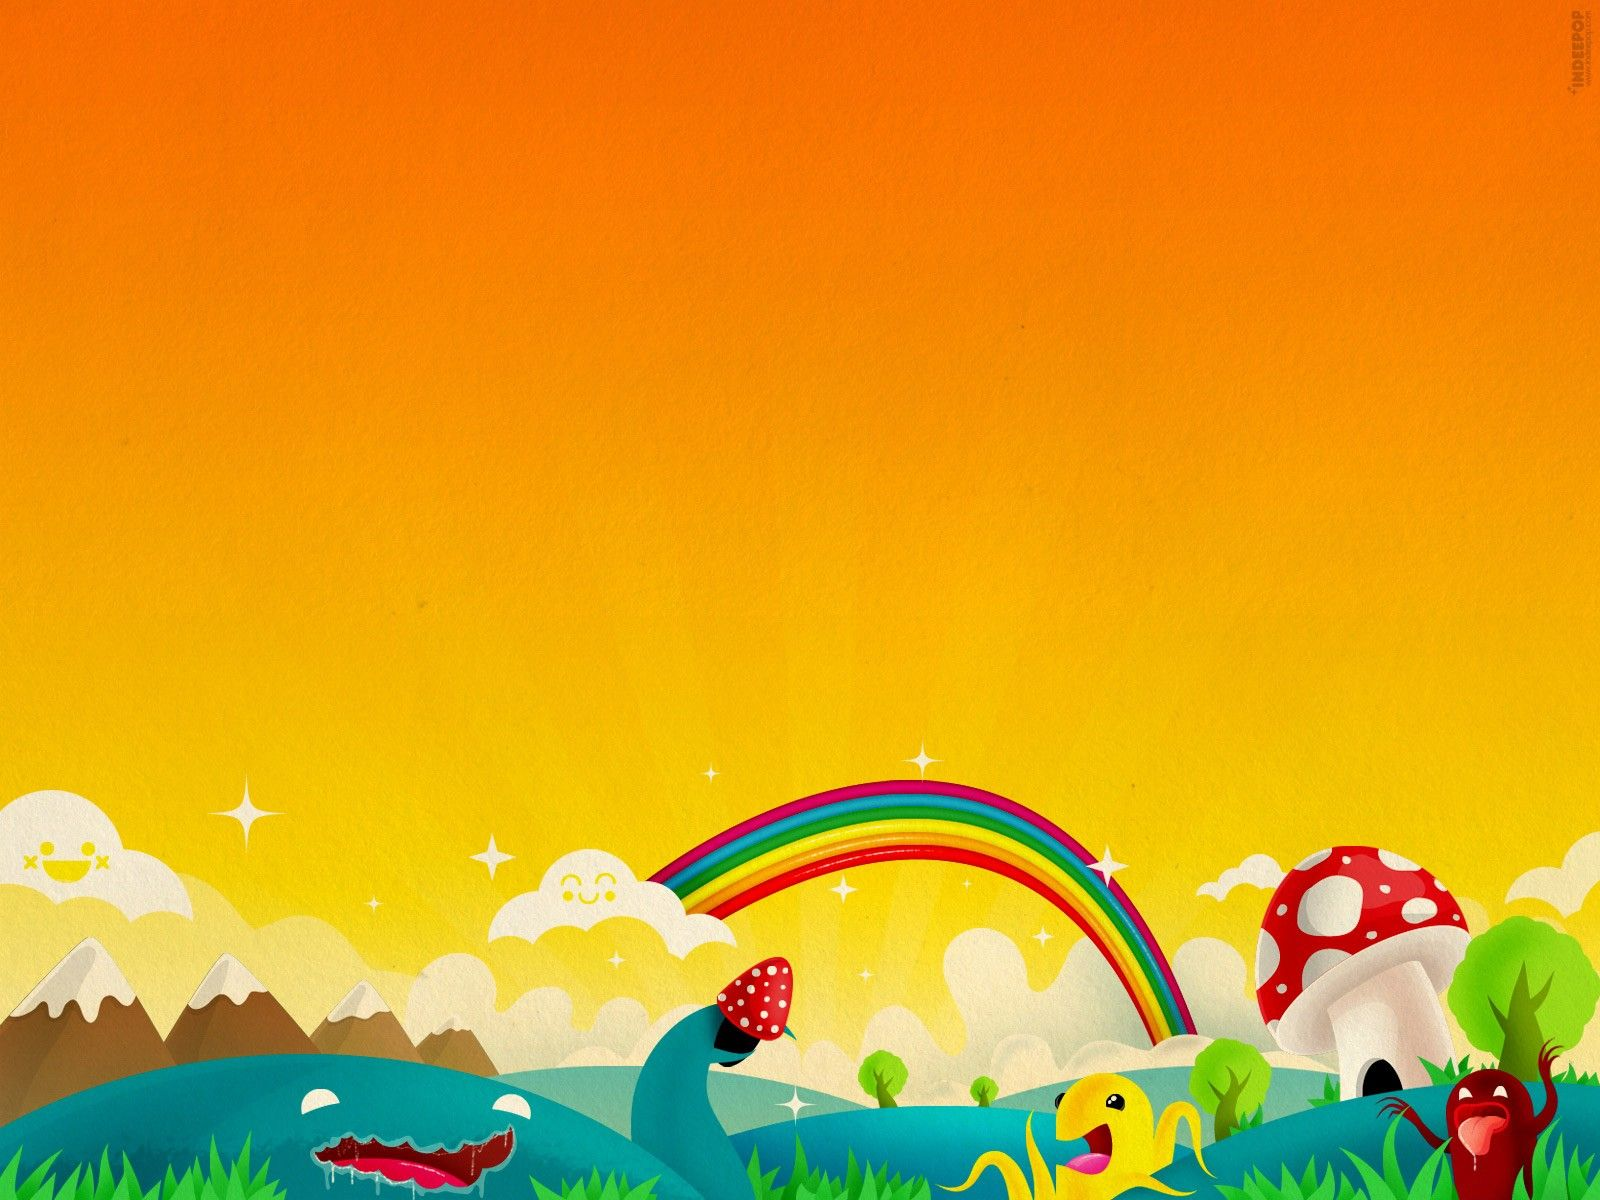 Colorful Wallpaper No 11626 Kids Wallpaper Cartoon Wallpaper Artistic Wallpaper